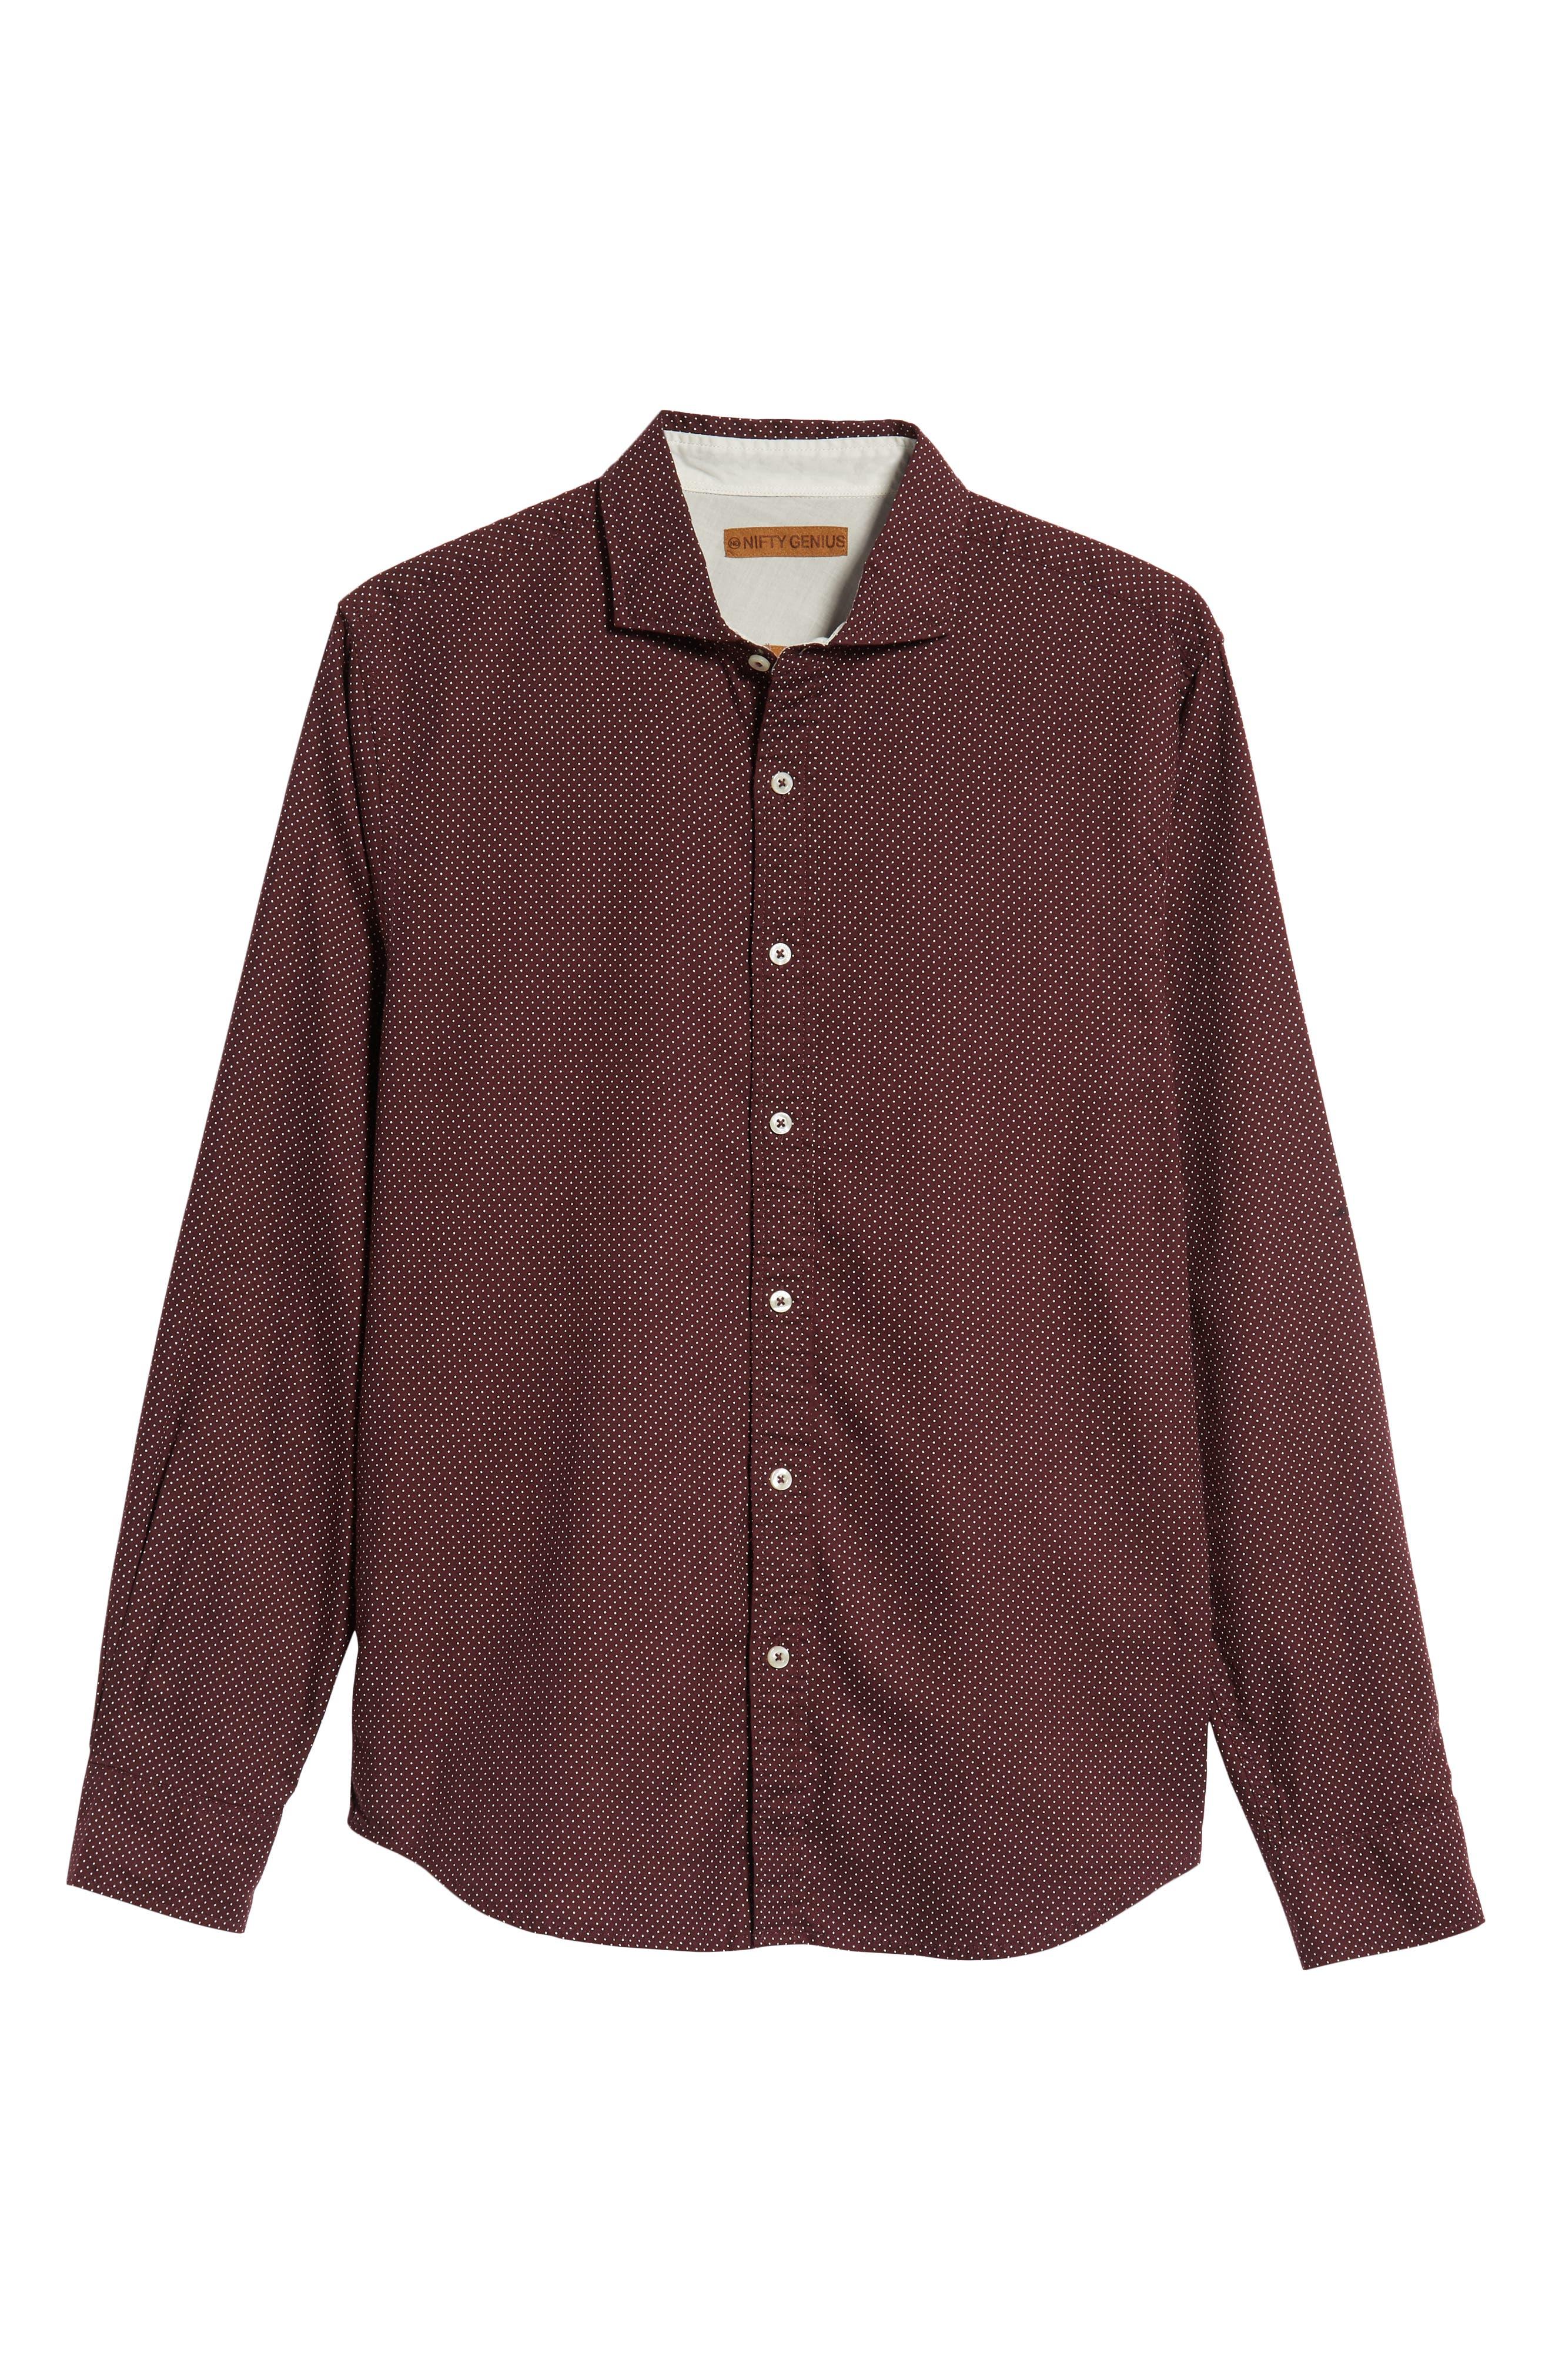 Earnest Regular Fit Dotted Sport Shirt,                             Alternate thumbnail 5, color,                             BURGUNDY